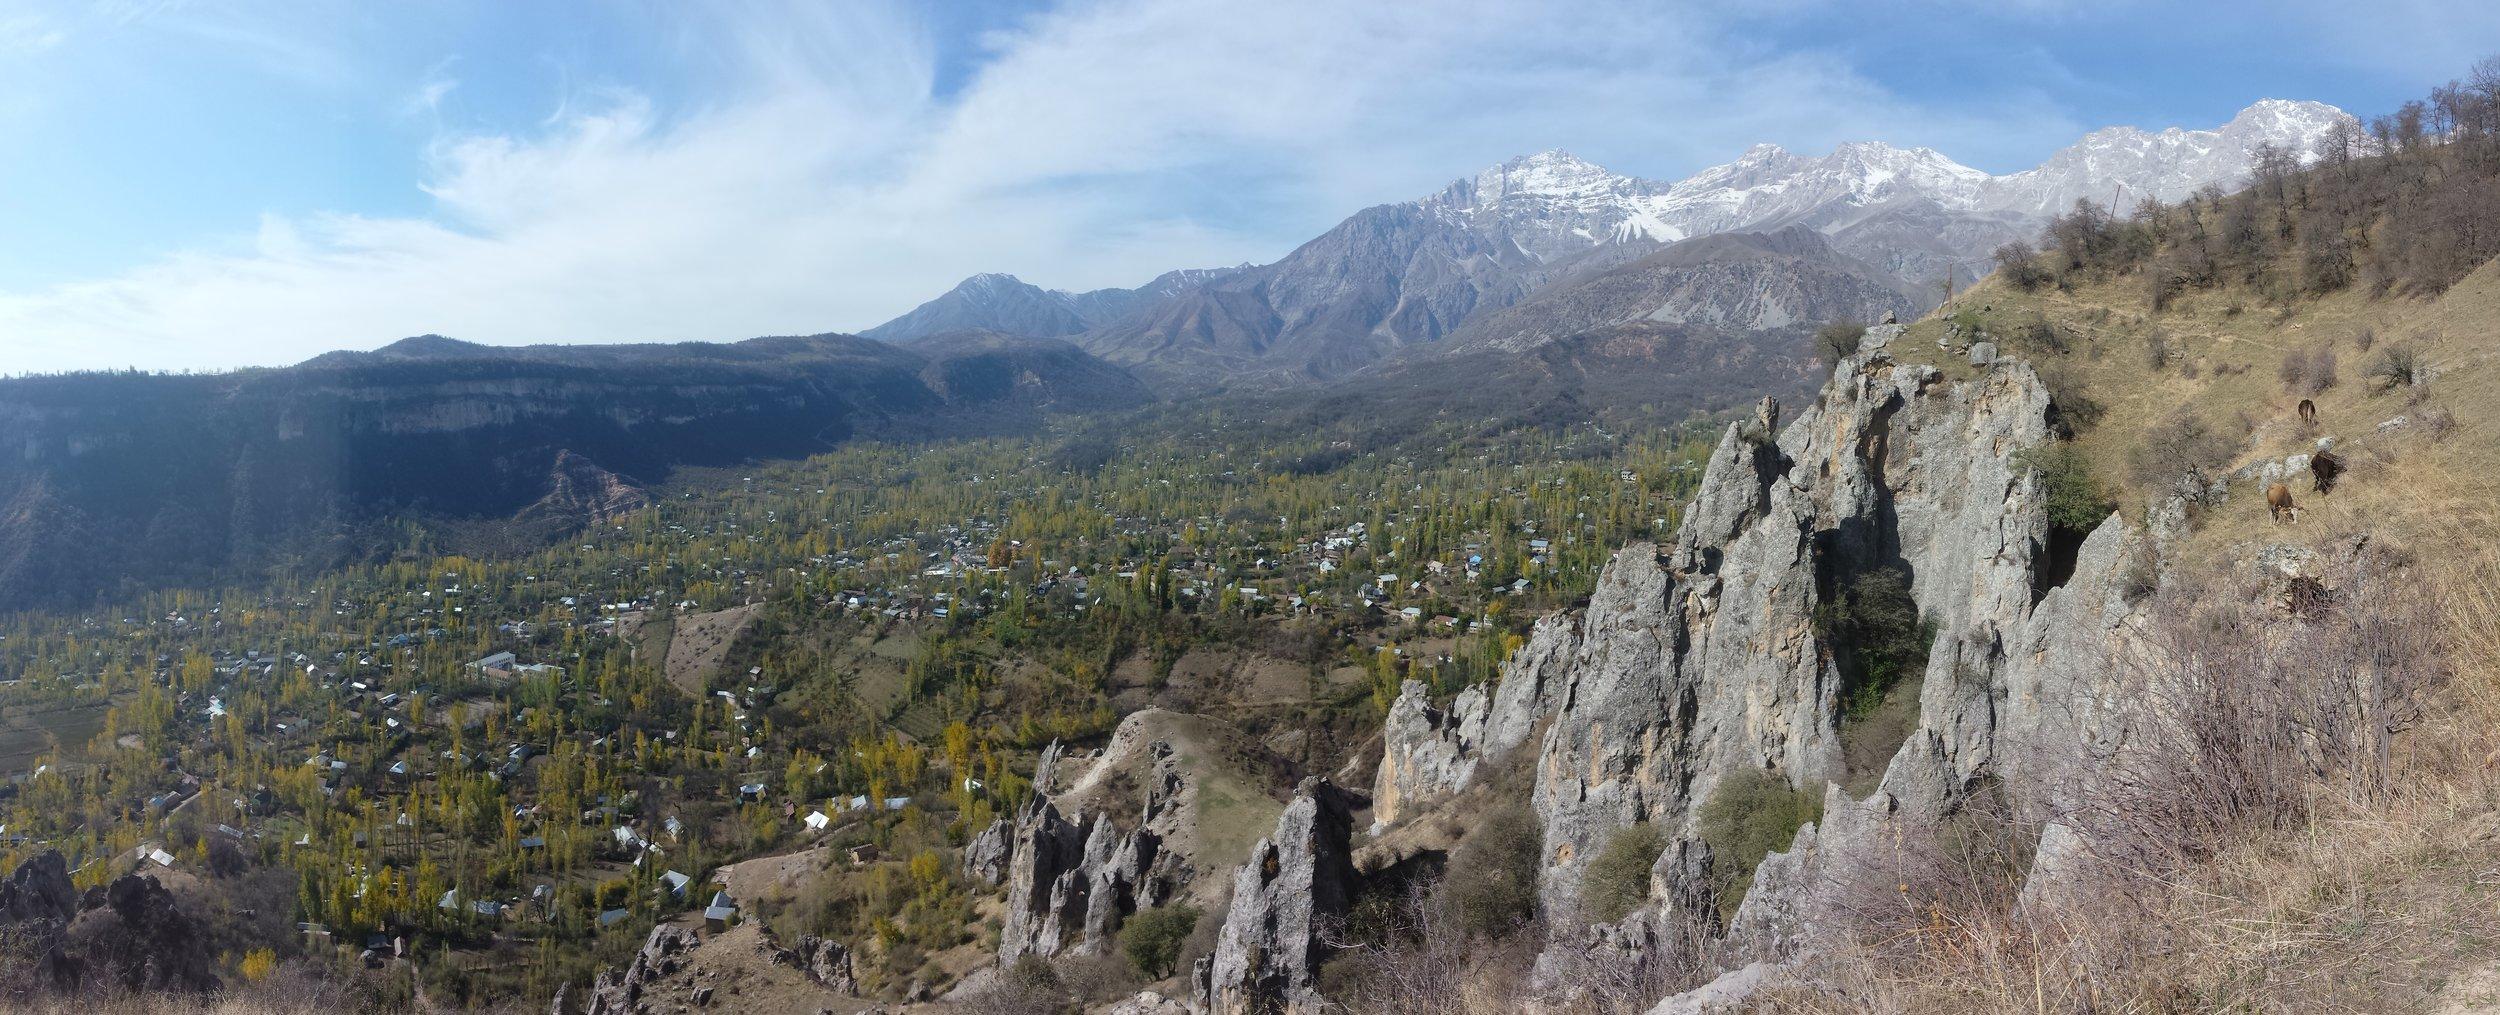 Big views over Arslanbob.